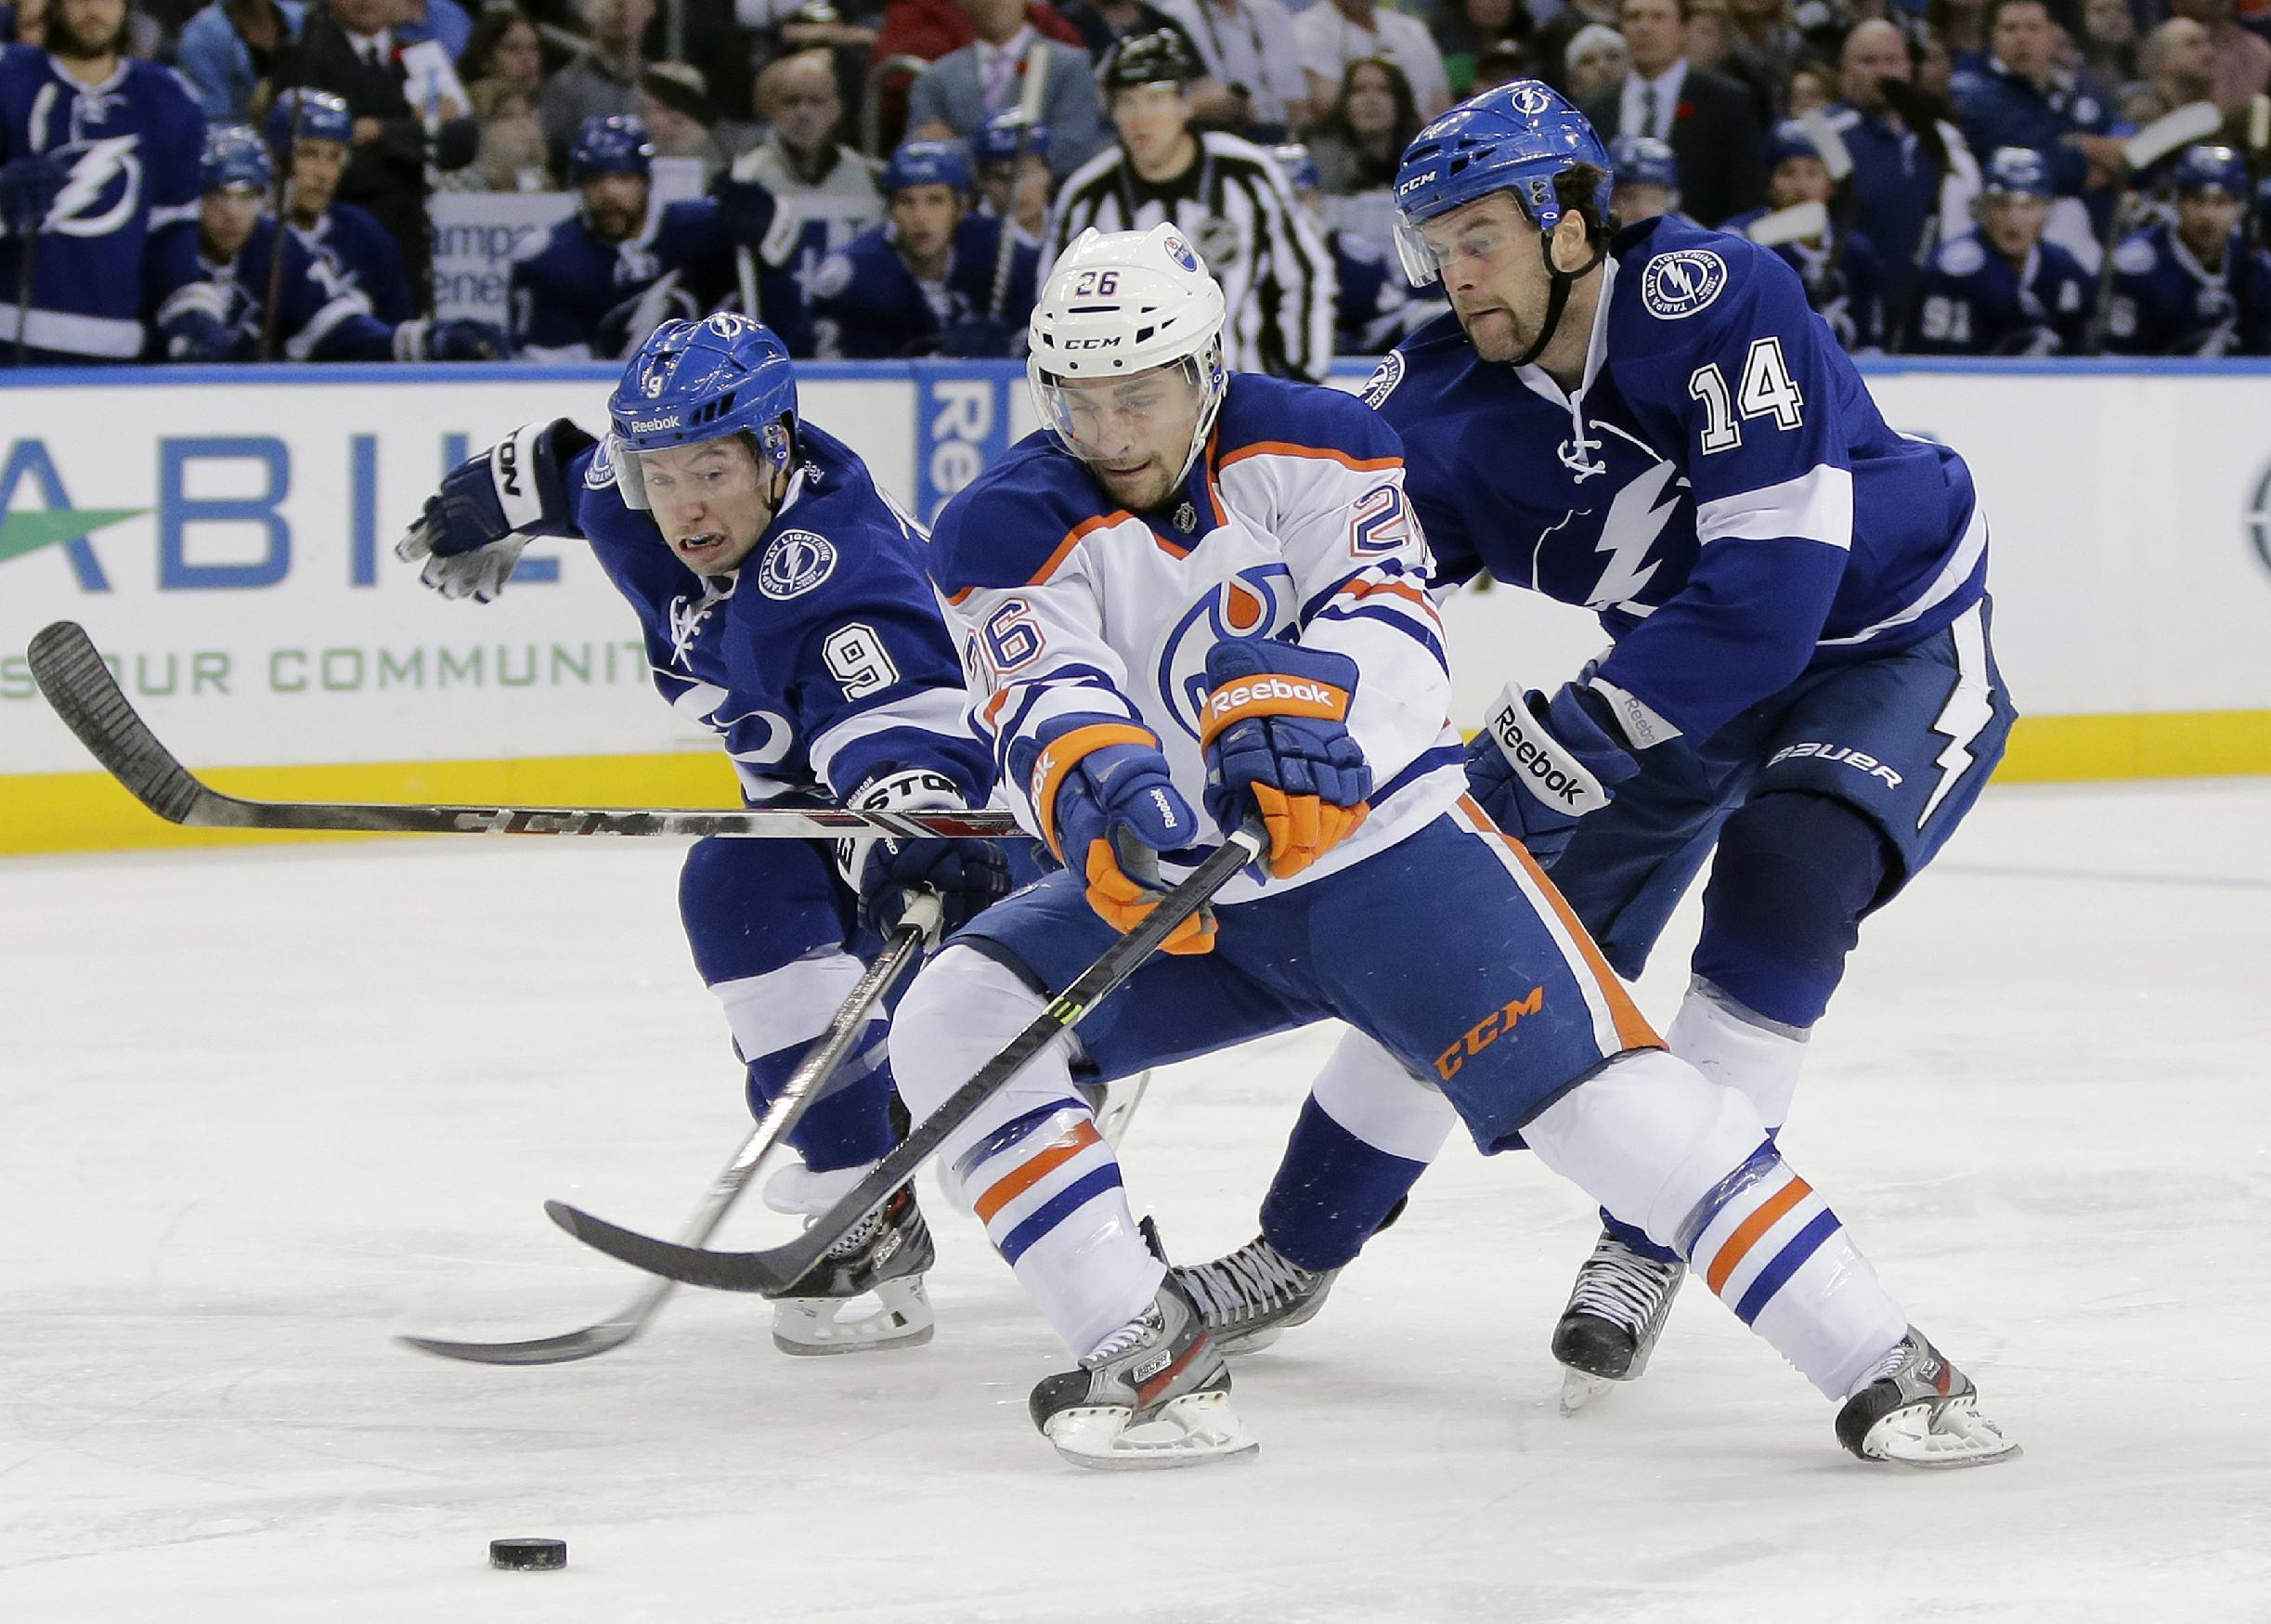 Stamkos has 2 goals, Lightning beat Oilers 4-2